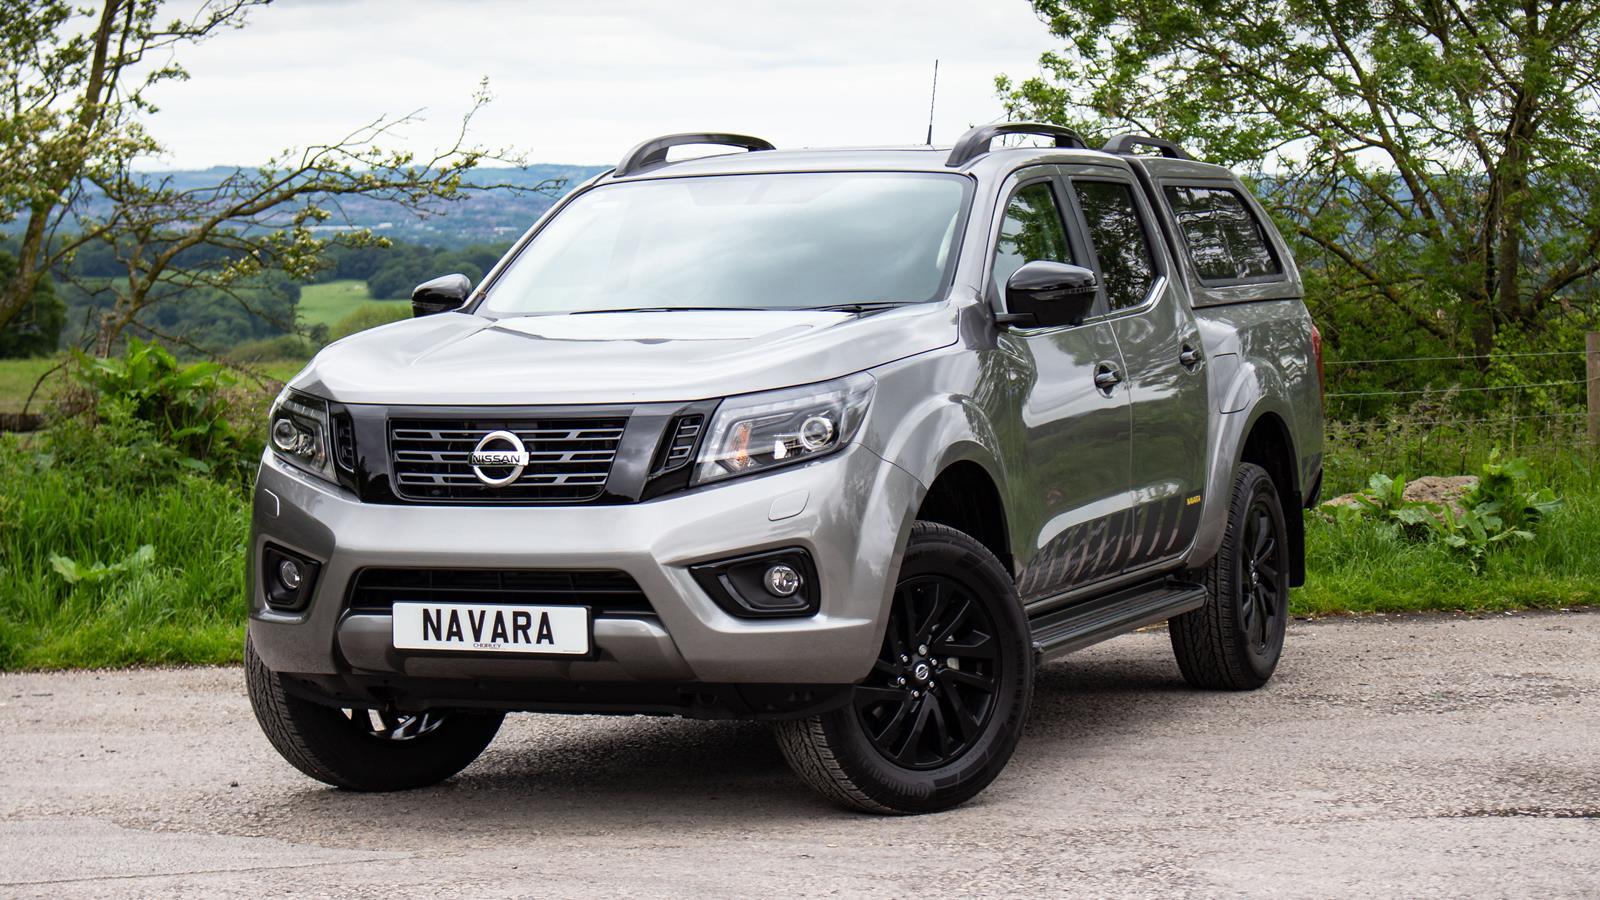 The Nissan Navara N-Guard brings new equipment to the model